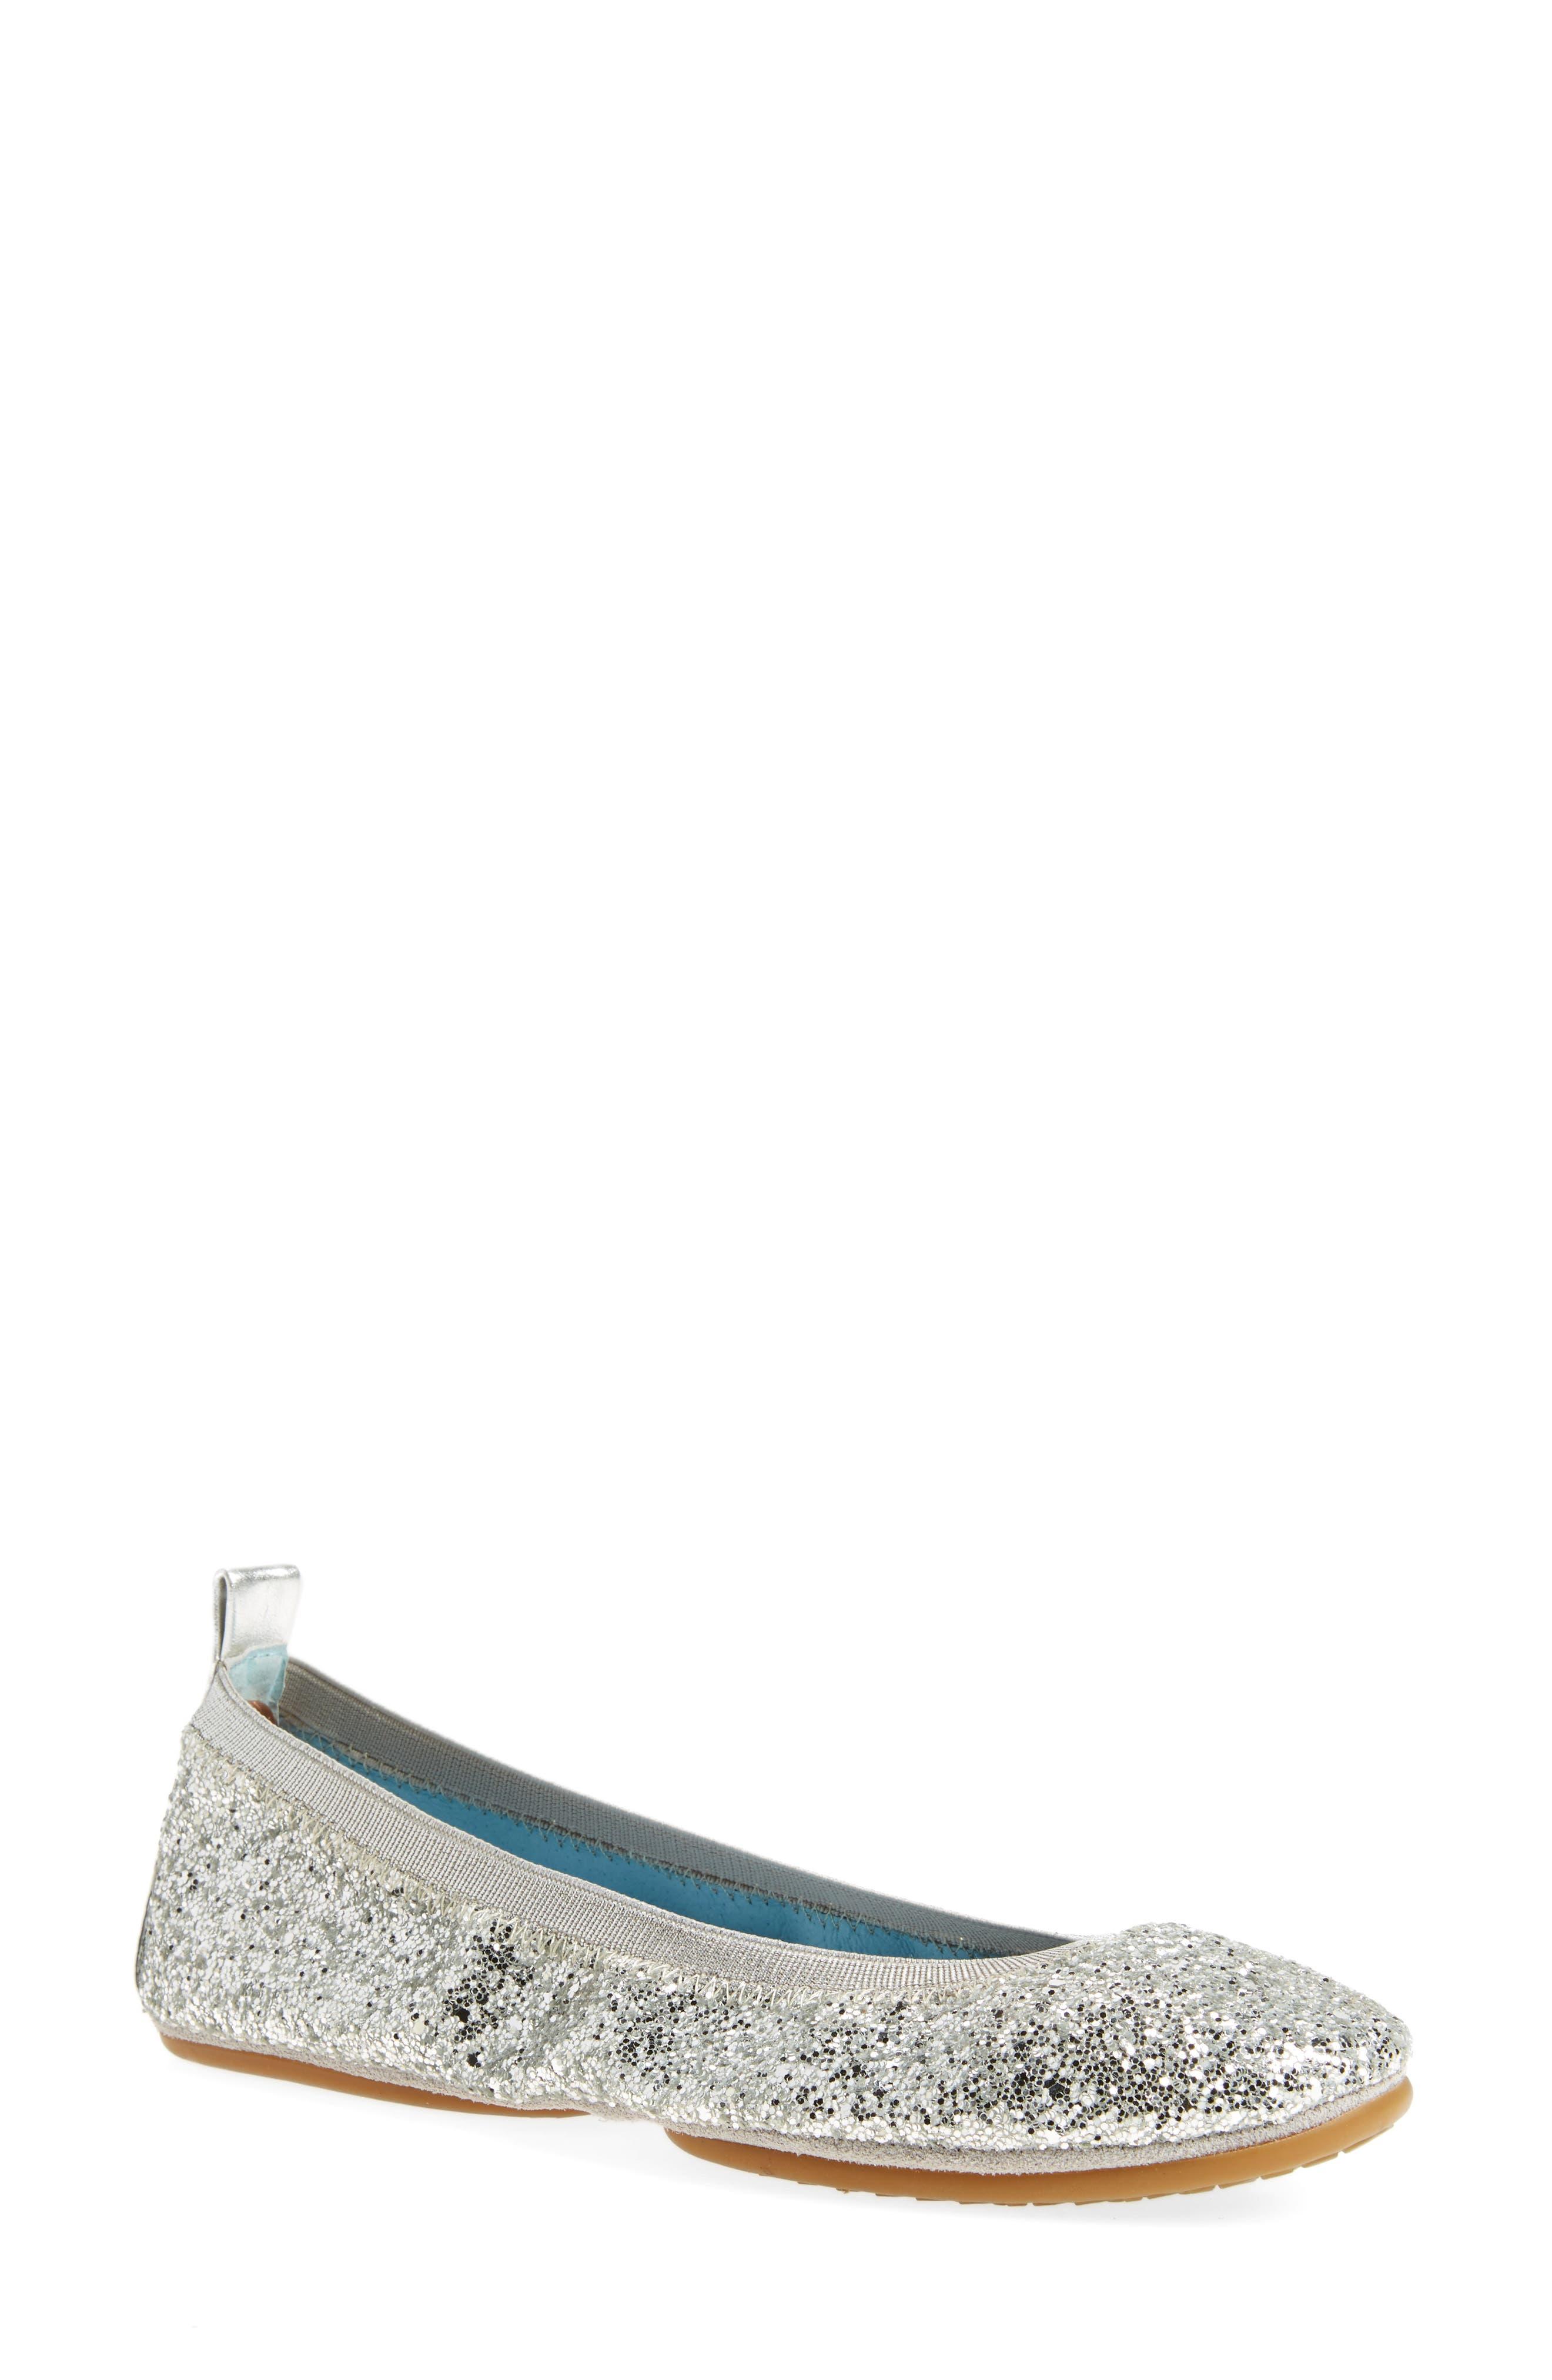 Serna Foldable Glitter Ballet Flat,                             Main thumbnail 1, color,                             Platinum Glitter